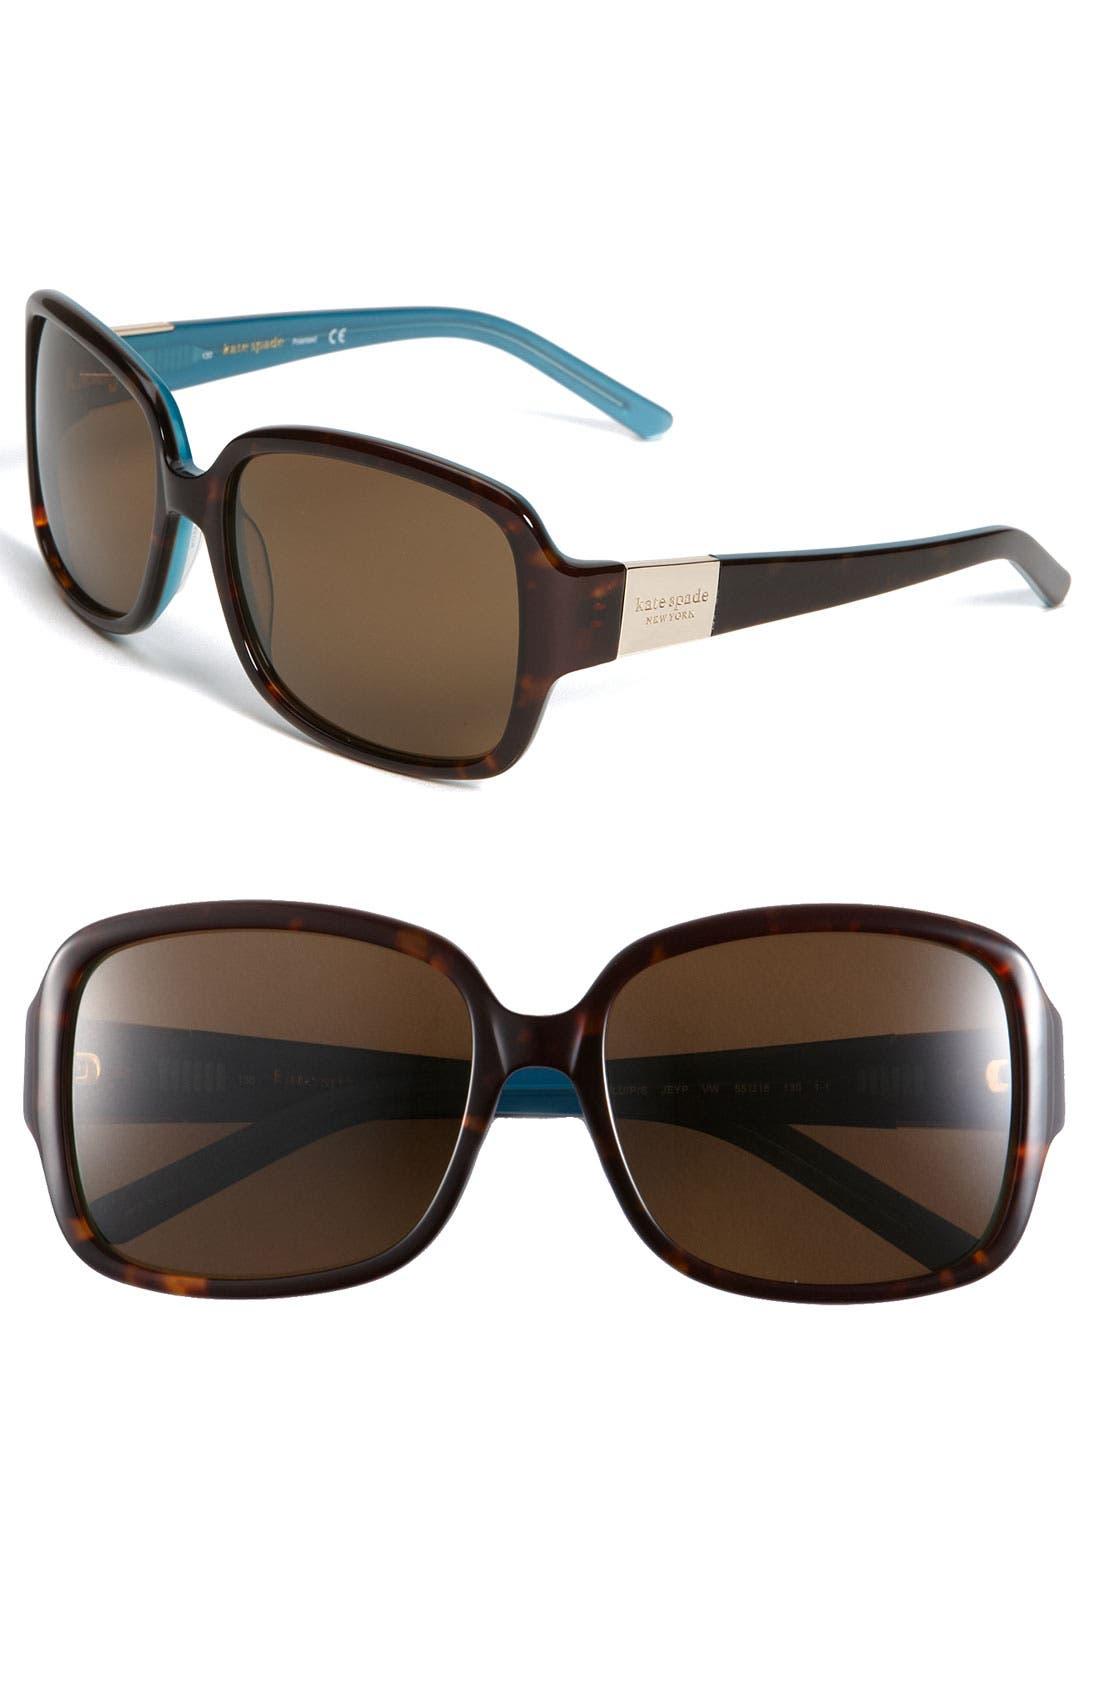 Main Image - kate spade new york 'lulu/p/s' 55mm polarized square sunglasses